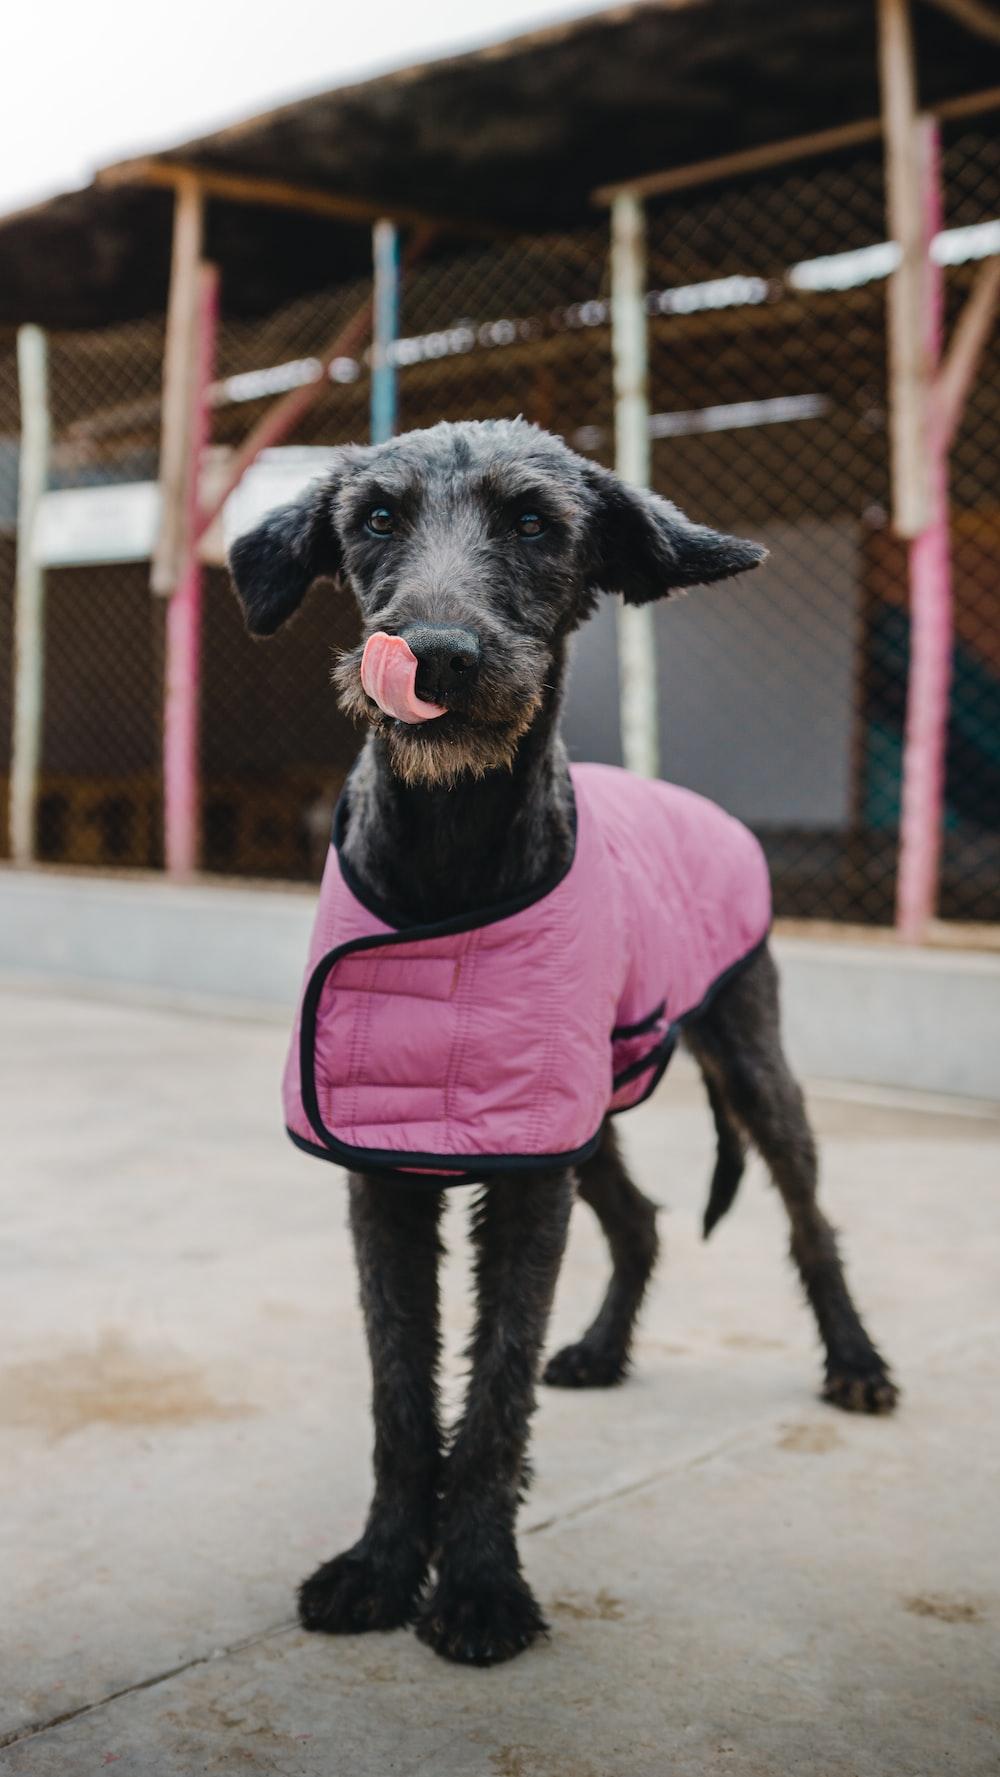 black and white short coated dog wearing pink shirt